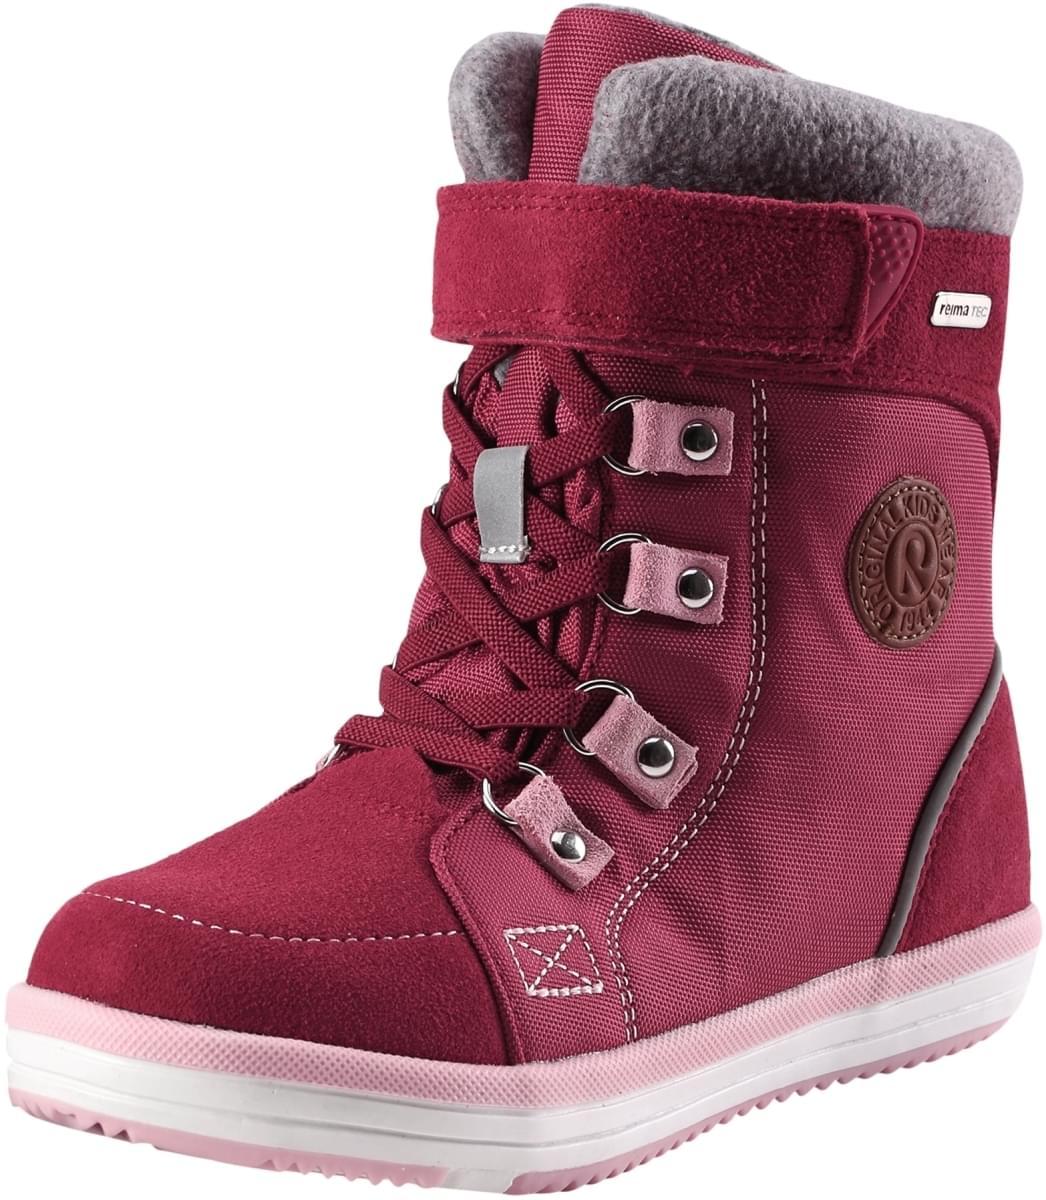 42fbb061ed8 Dětské zimní boty Reima Freddo Jr - Dark berry - Skibi Kids